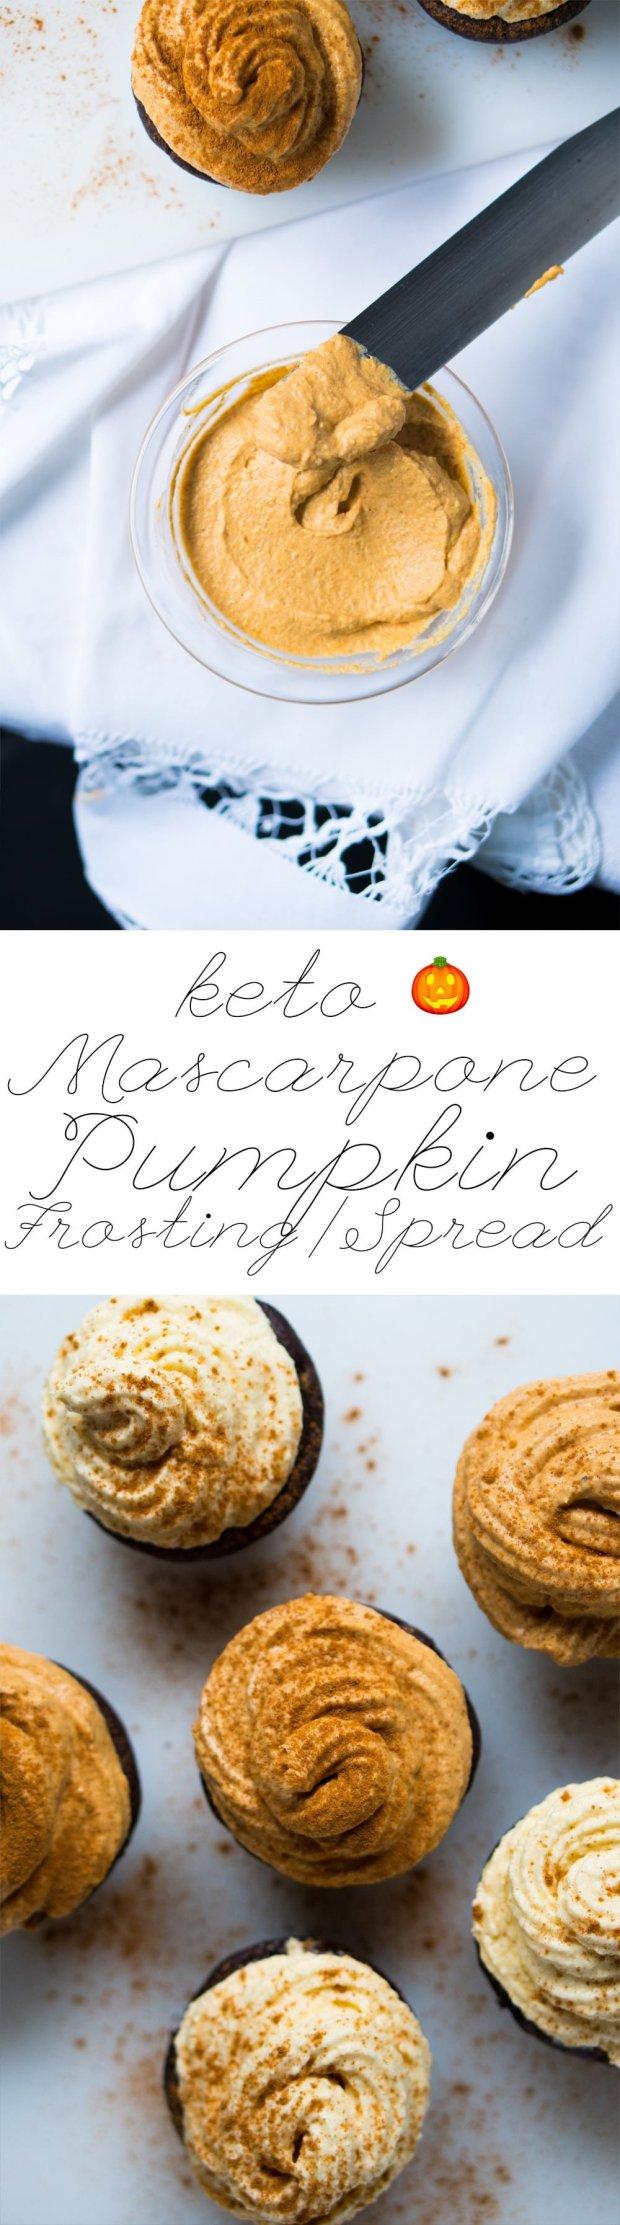 Keto Pumpkin Mascarpone Frosting (or Spread) ?